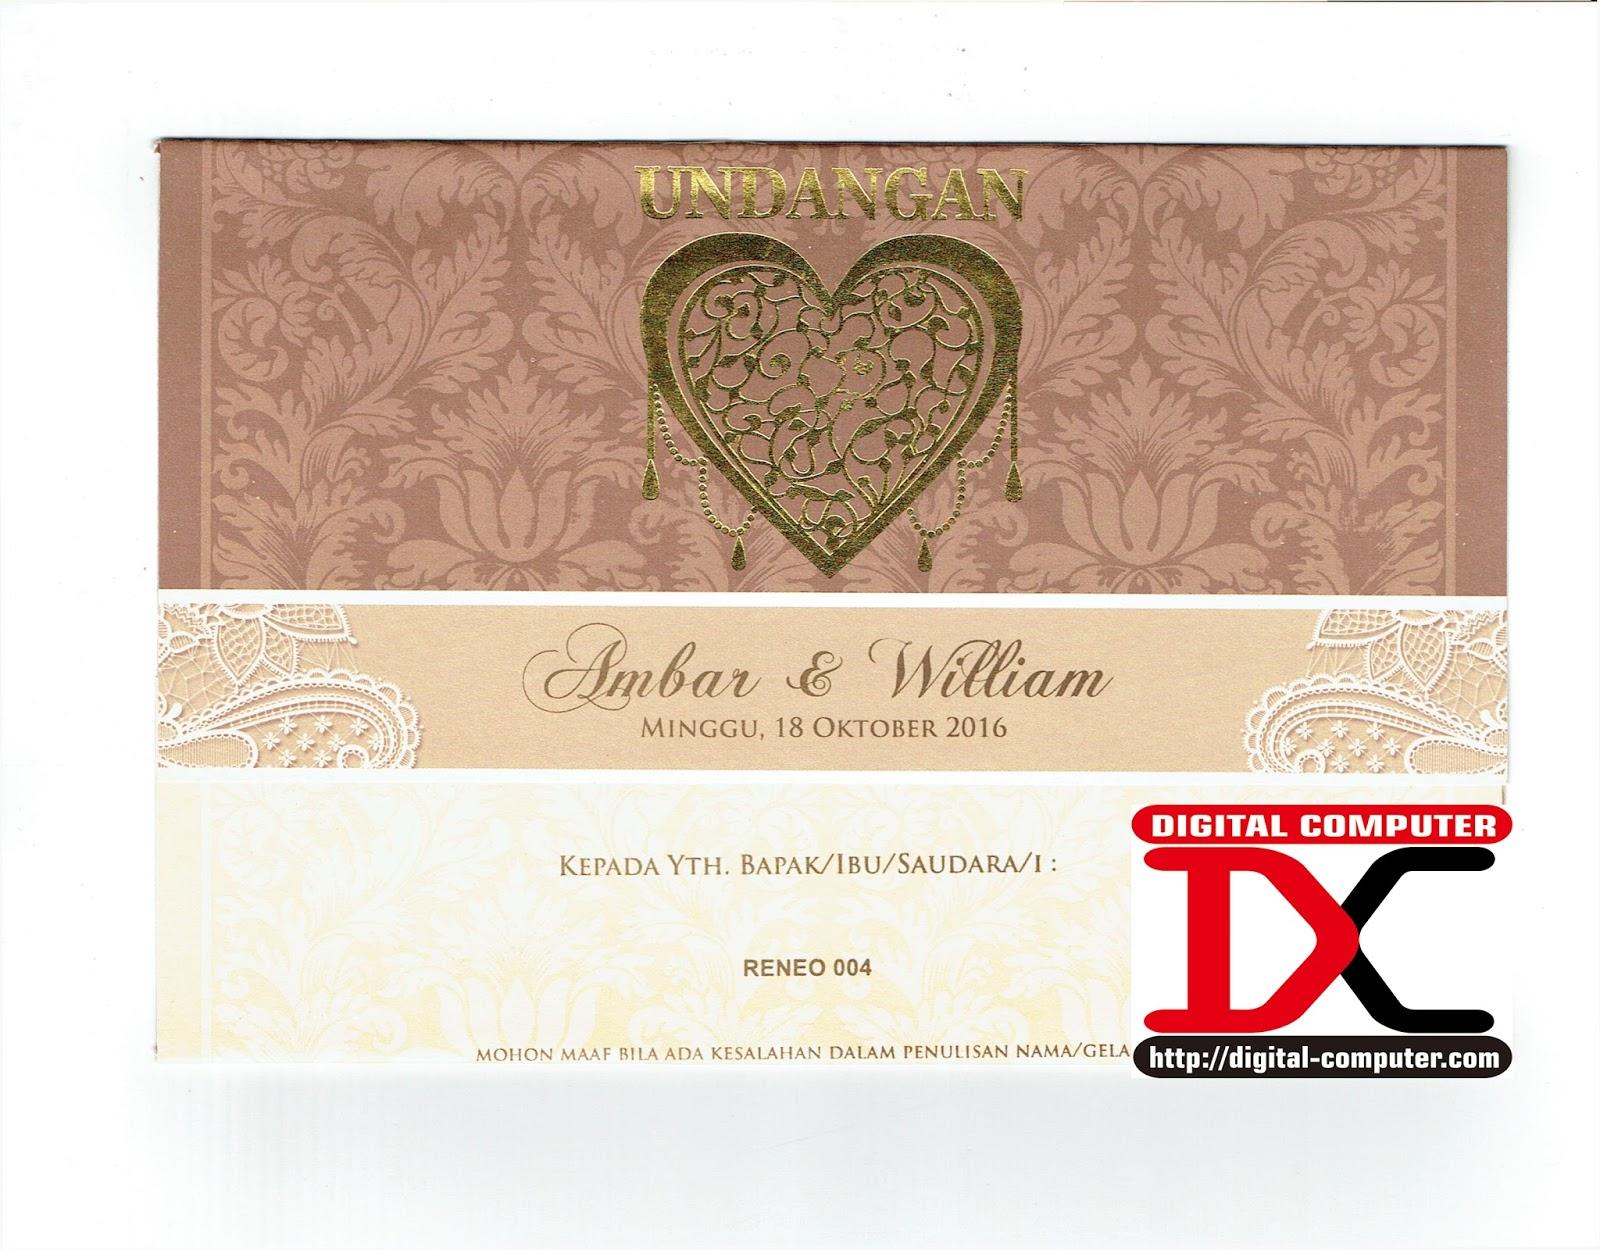 undangan pernikahan harga 2200